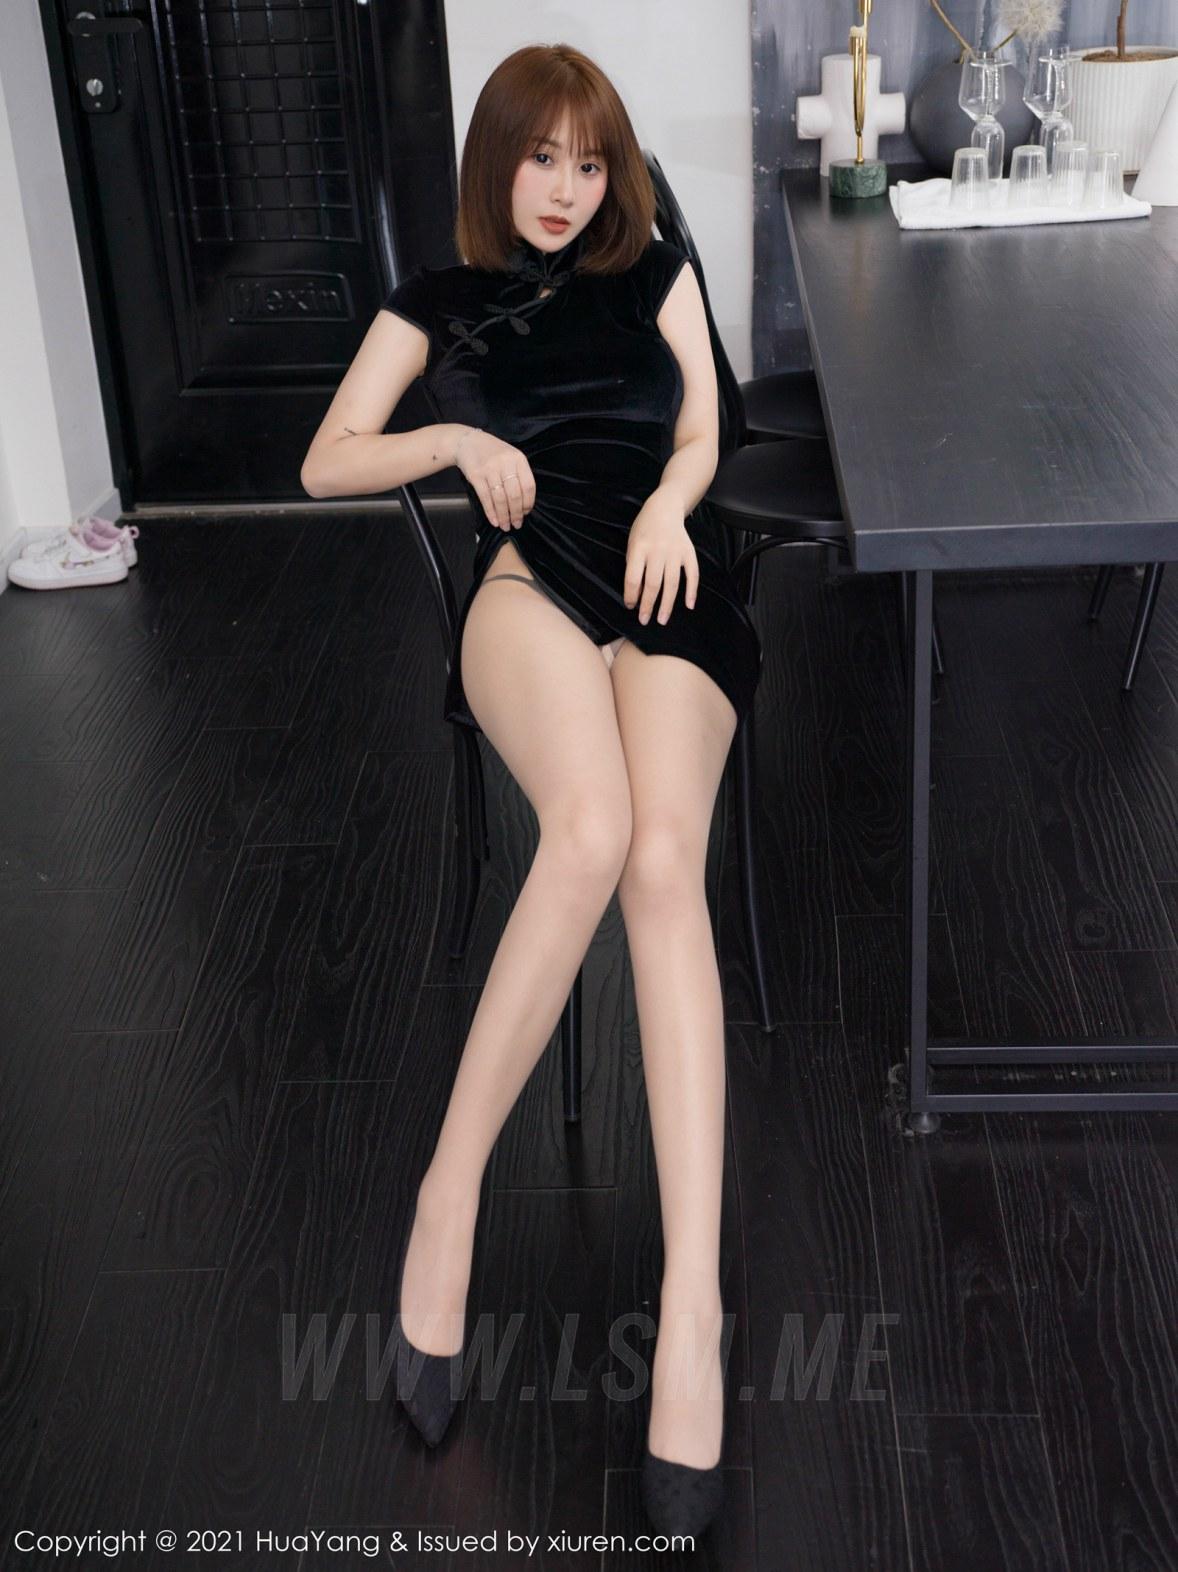 HuaYang 花漾show Vol.428 新人模特 恬恬GuTIan 旗袍与魅惑丝袜第... - 1